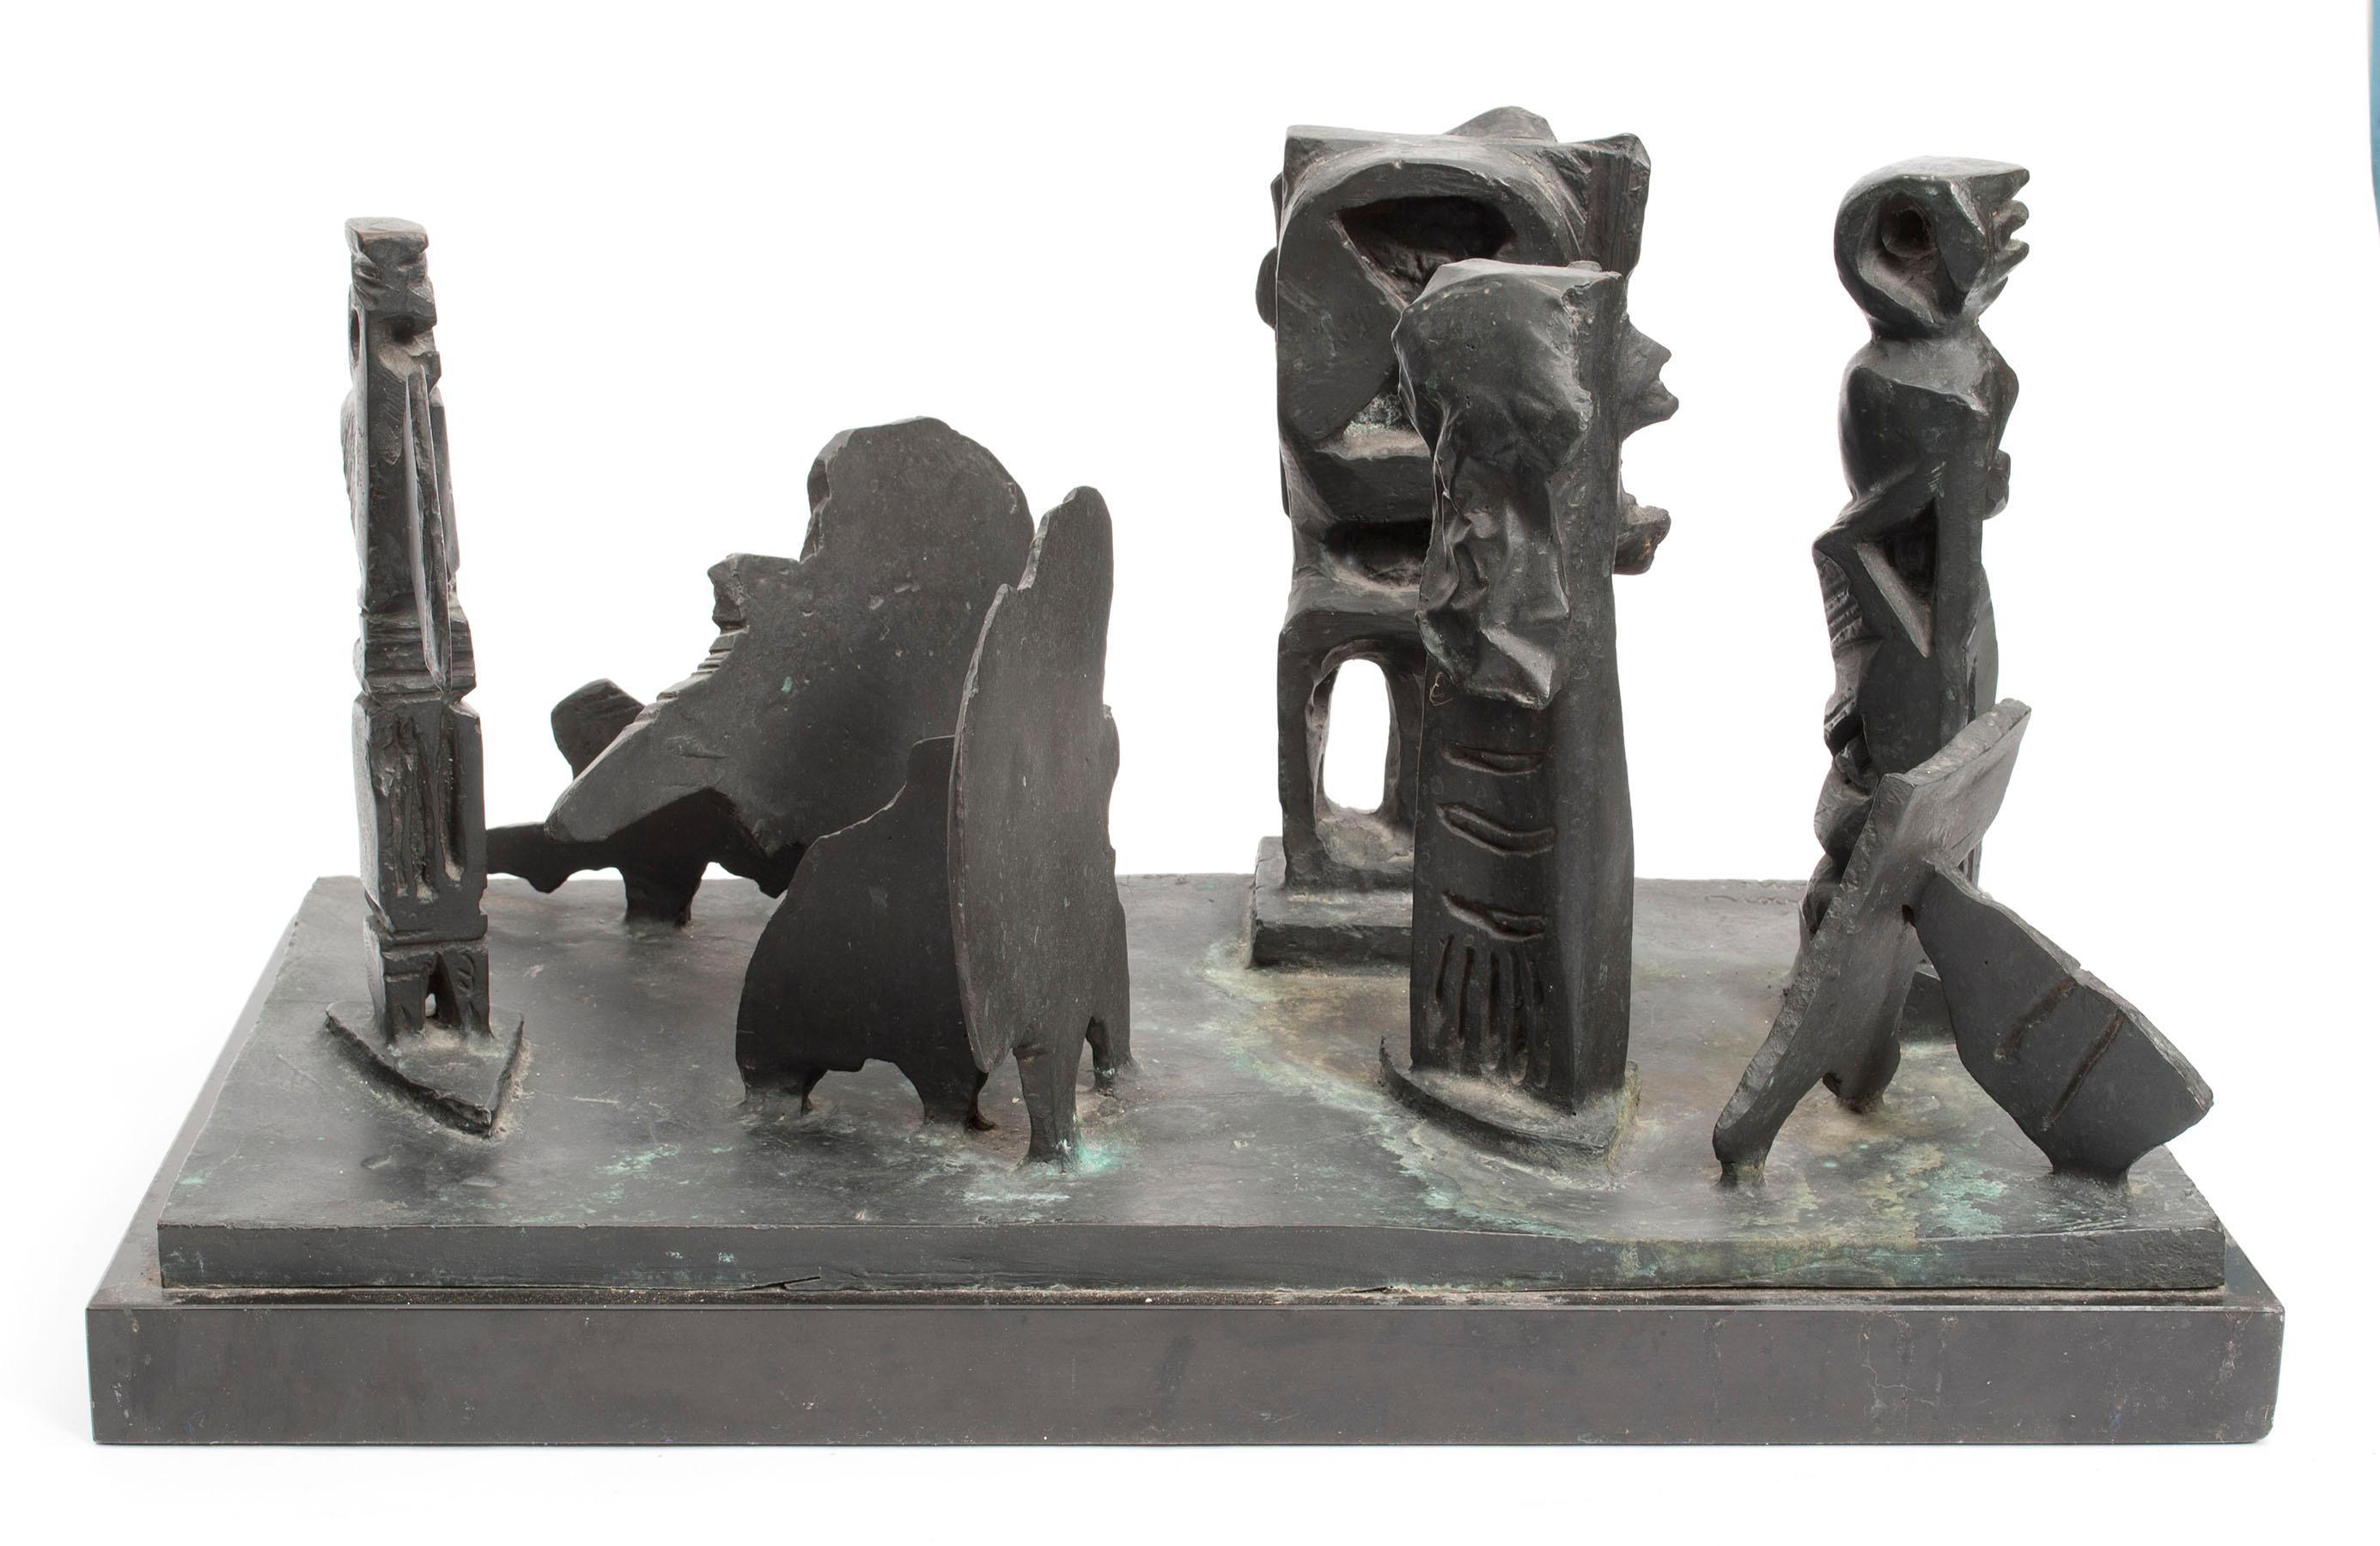 Brutalist Modern Abstract Bronze Sculpture Metropolis Manner of Louise Nevelson